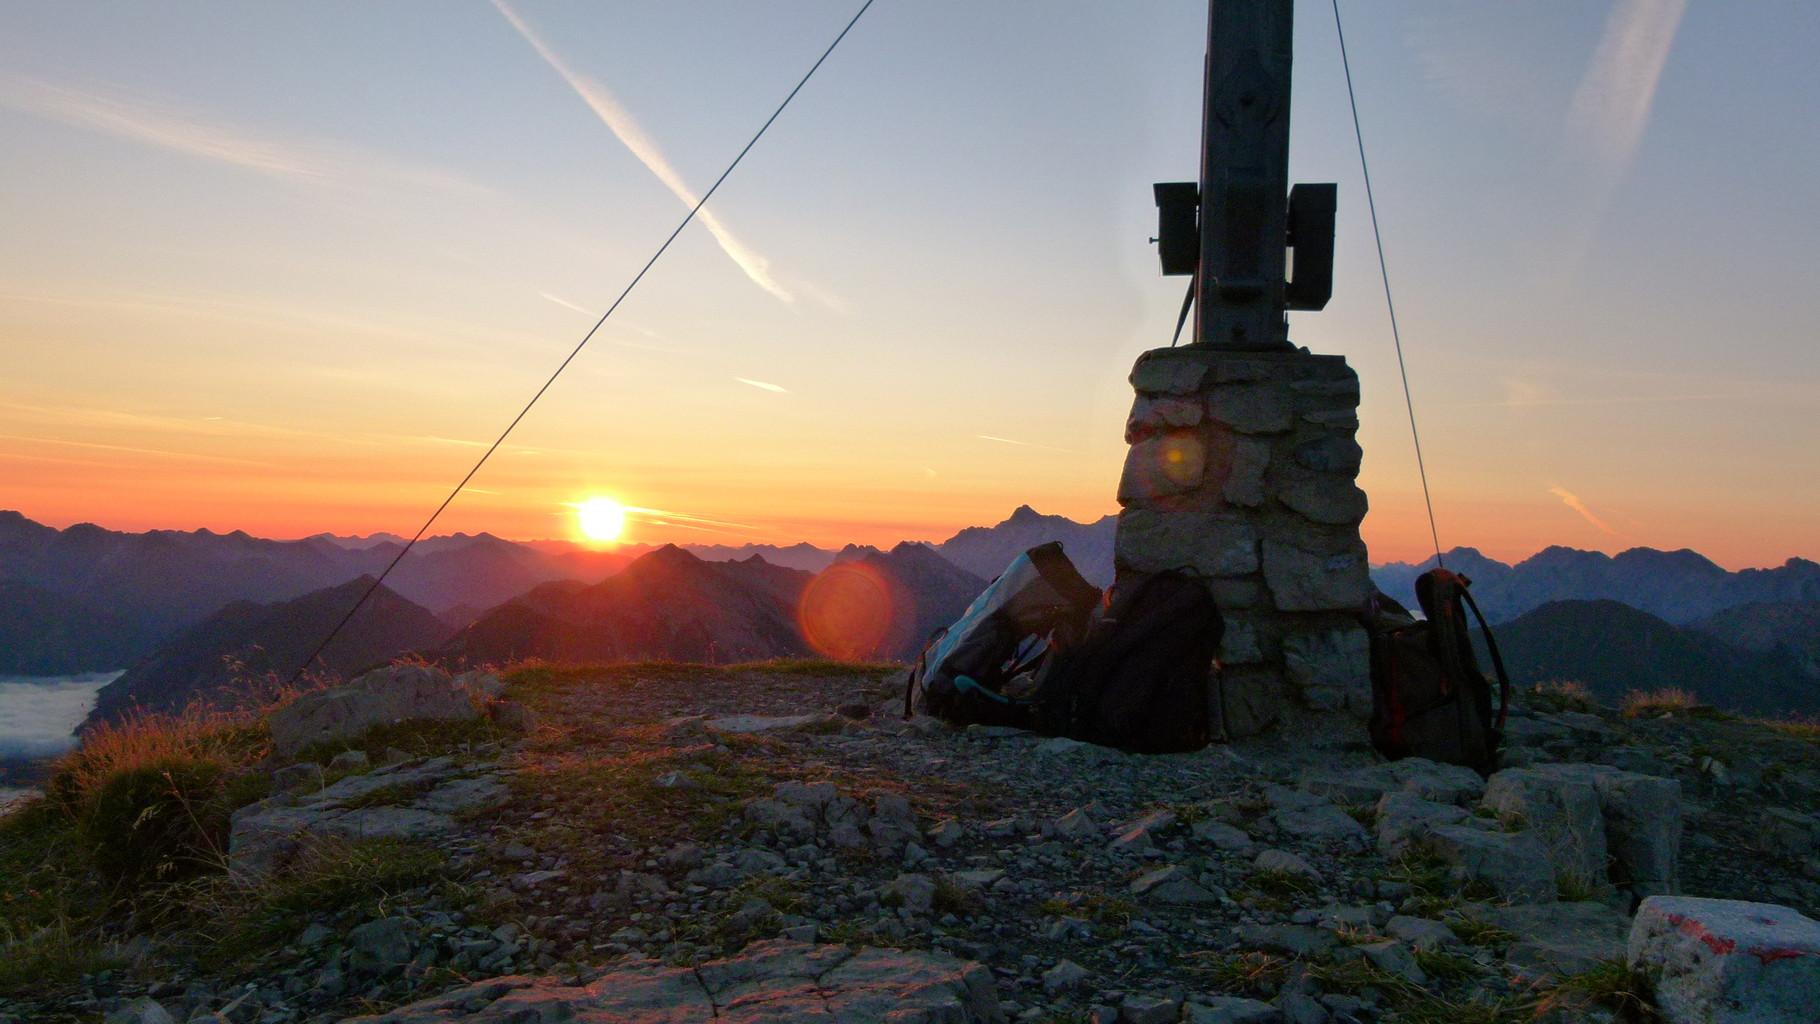 Wunderbarer Blick mit der Sonne hinter dem Gipfelkreuz